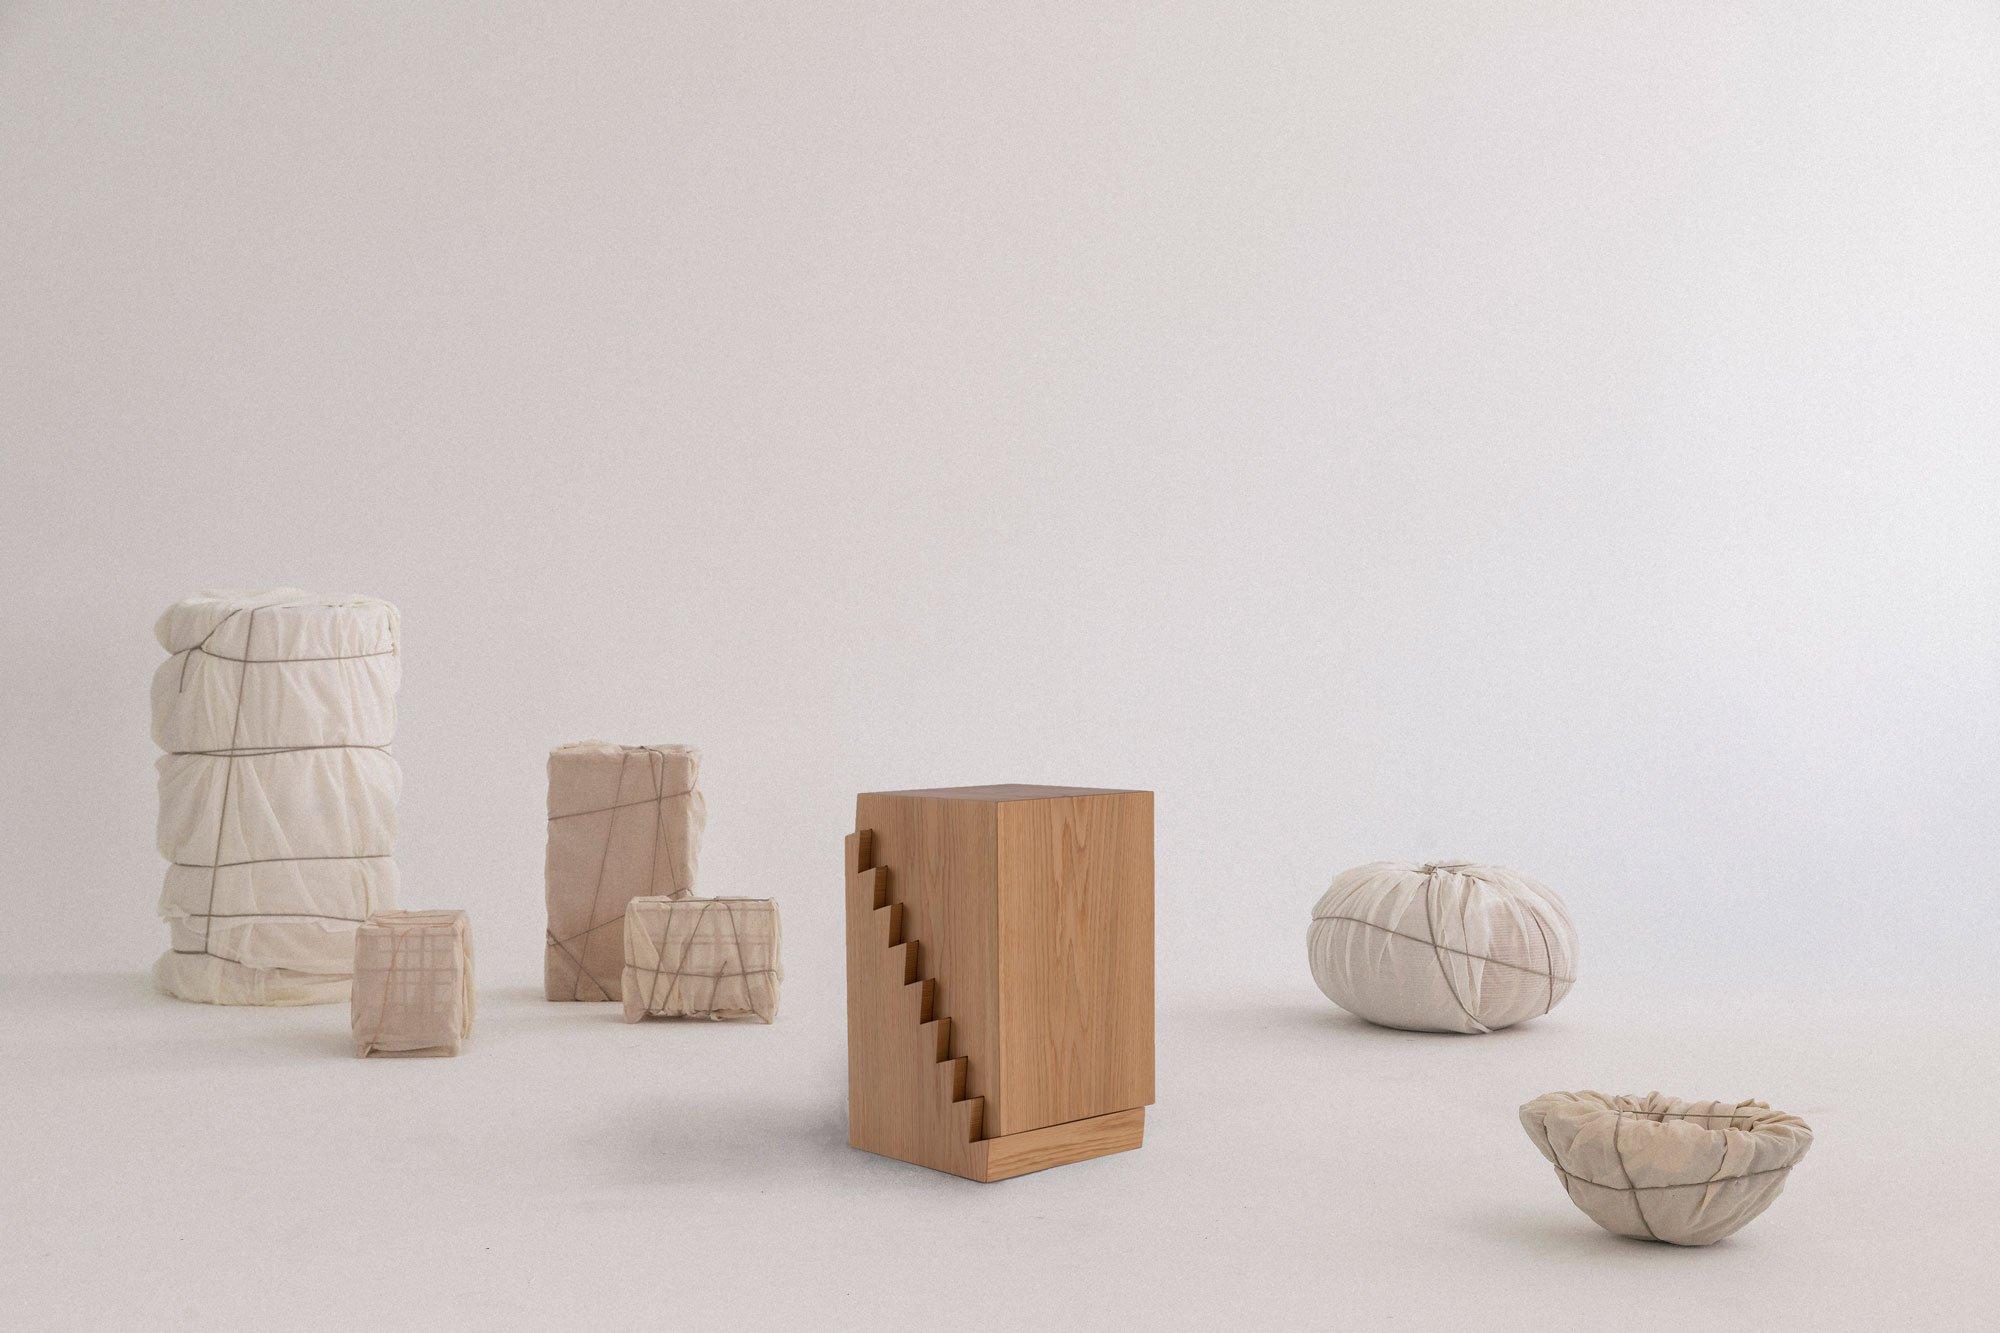 Ukurant Objects, 3daysofdesign 2020, jeunes designers, Bjarke Ballisager